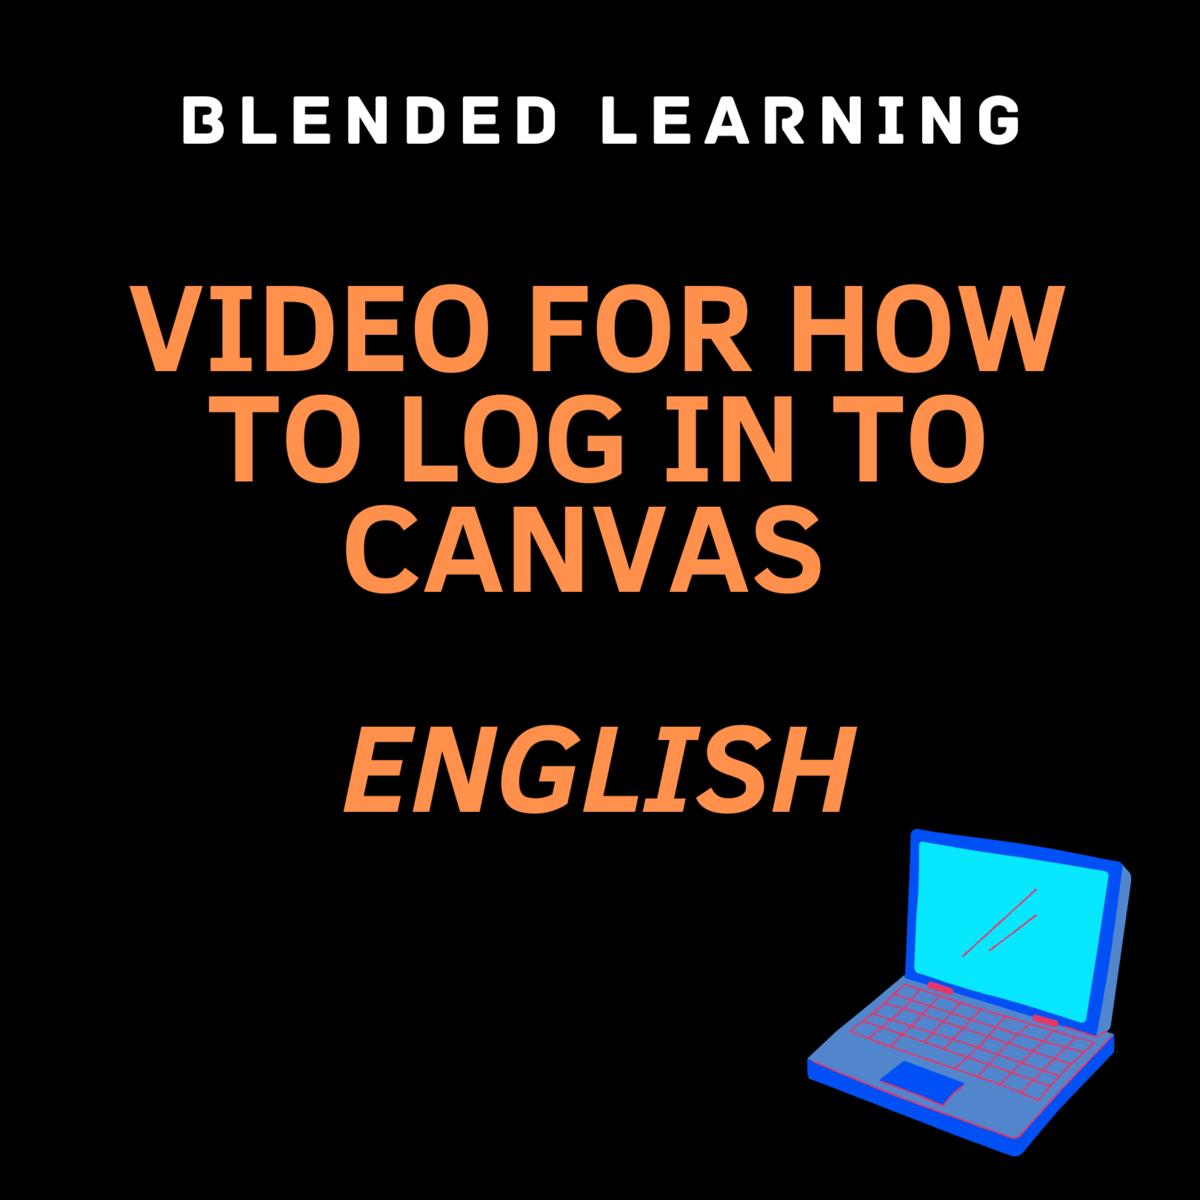 canvas log in english